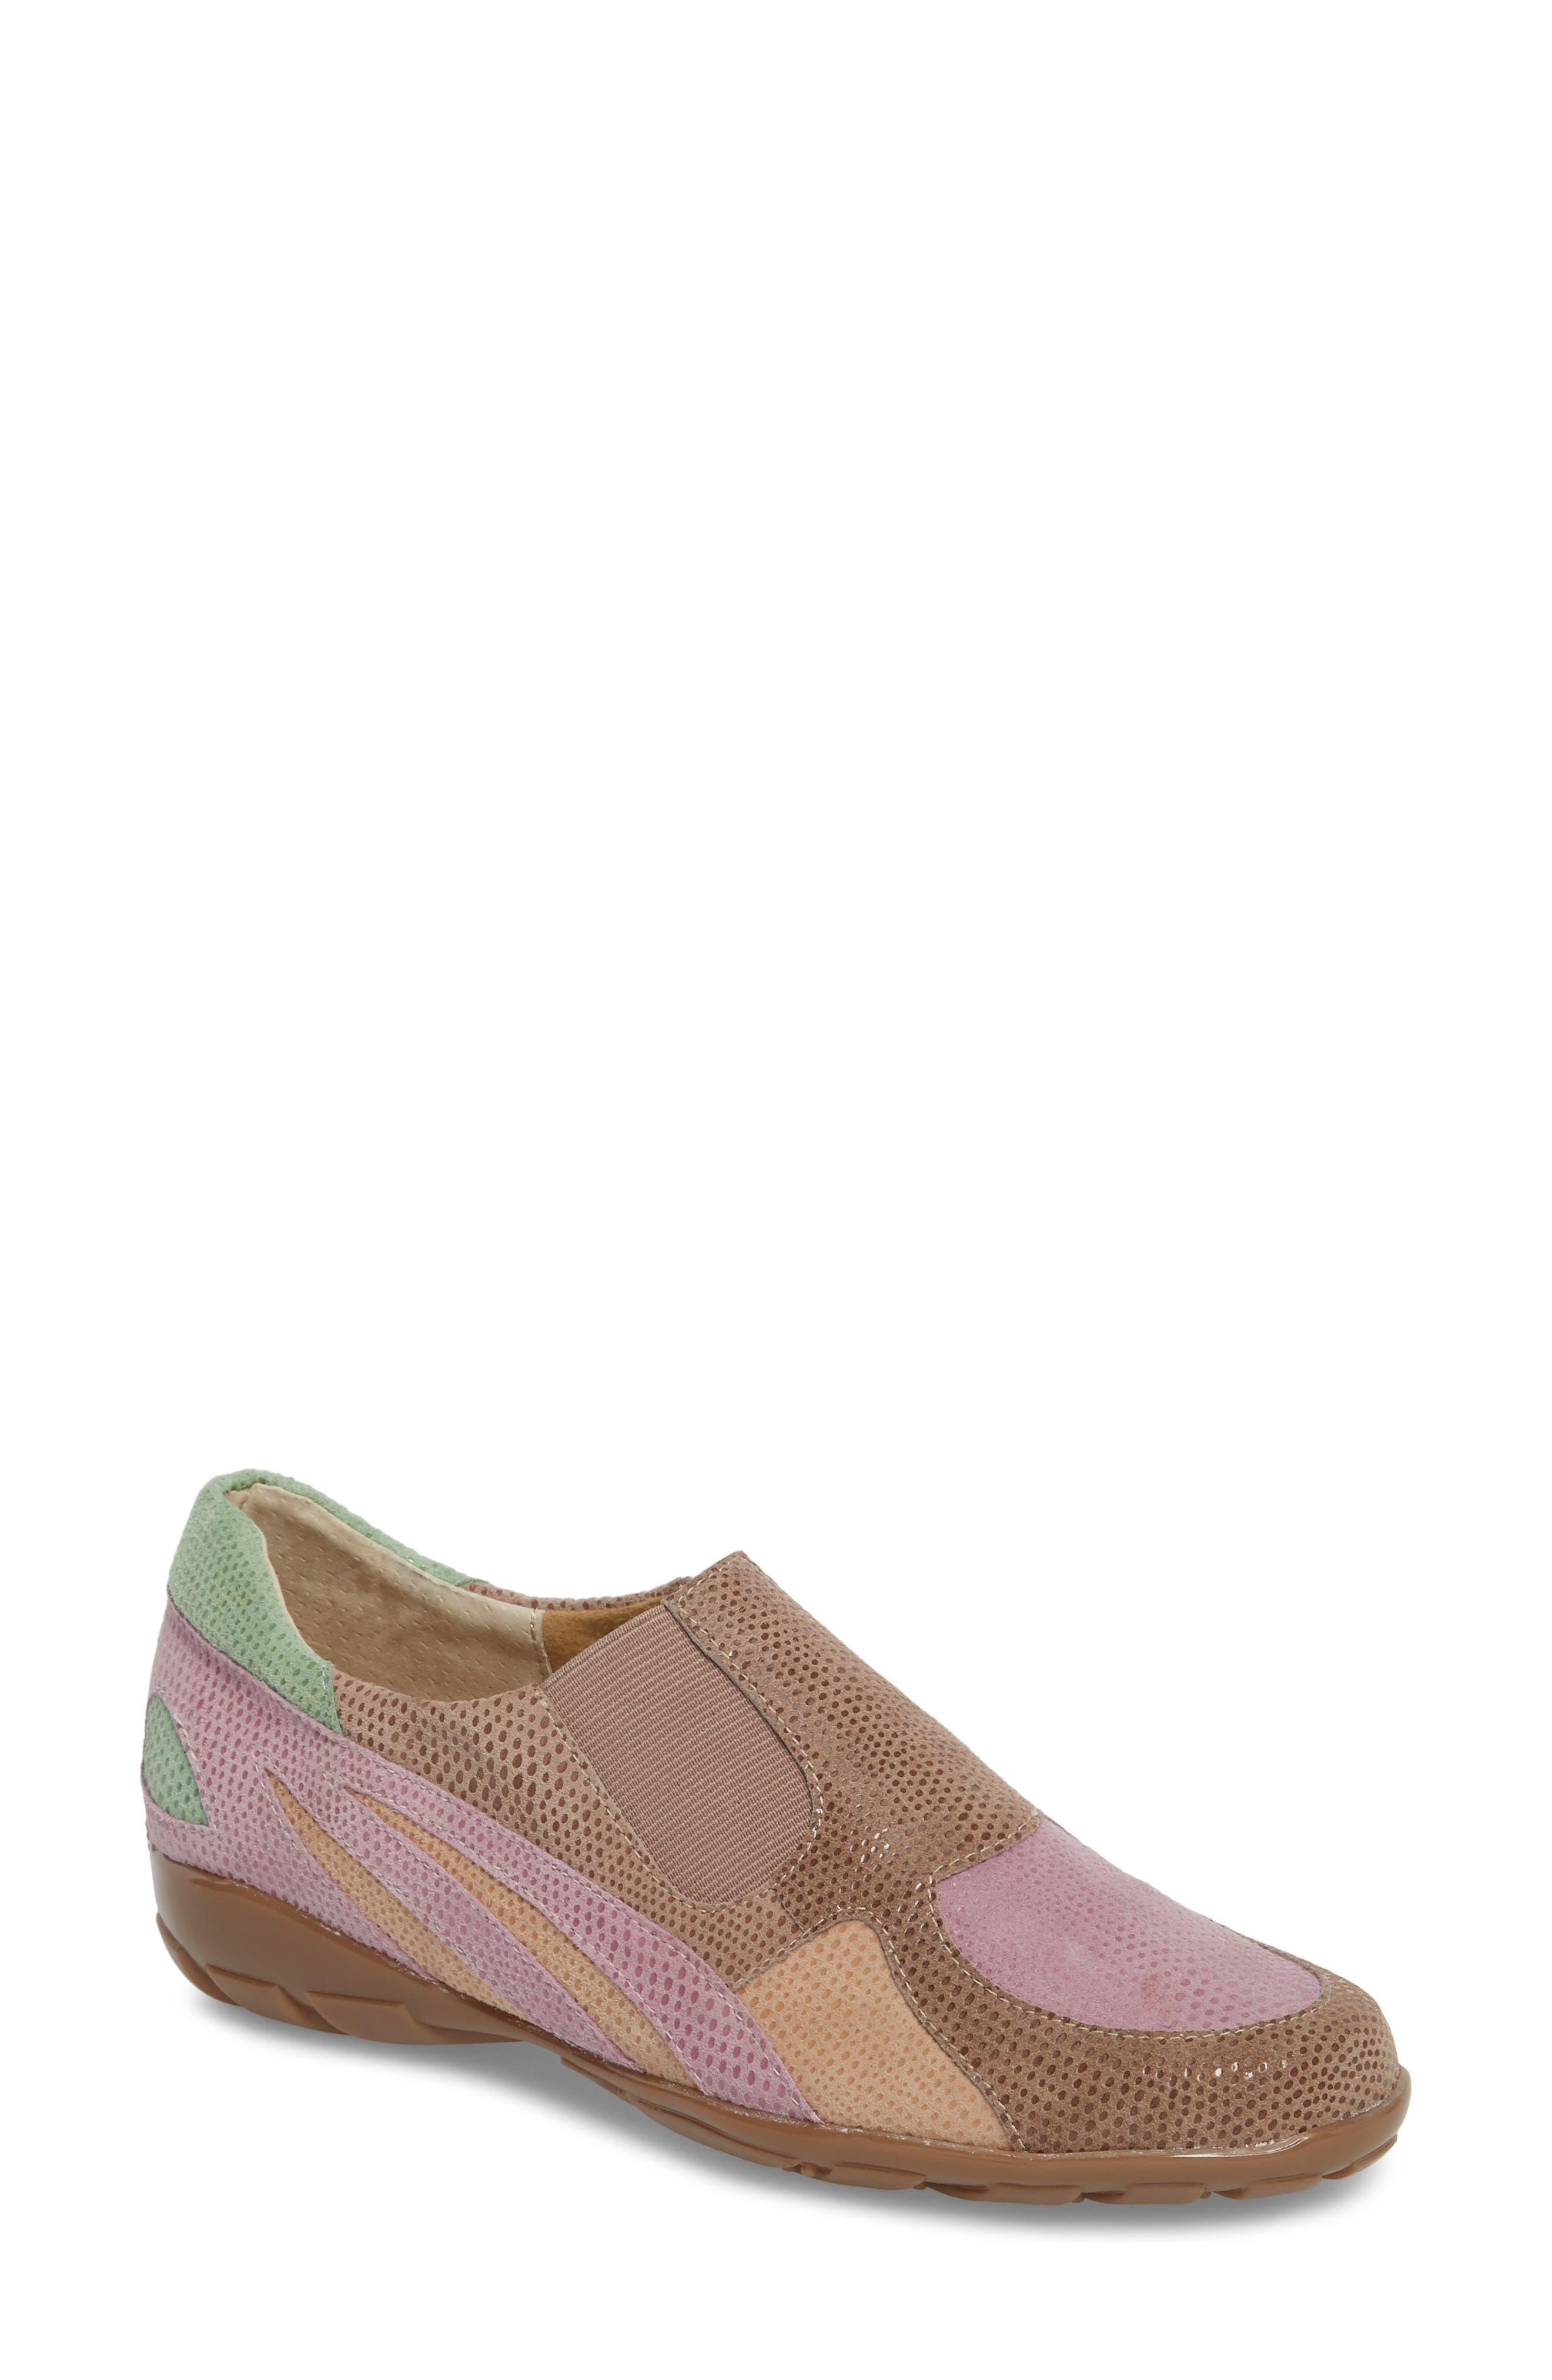 'Attie' Colorblock Slip-On Flat,                         Main,                         color,